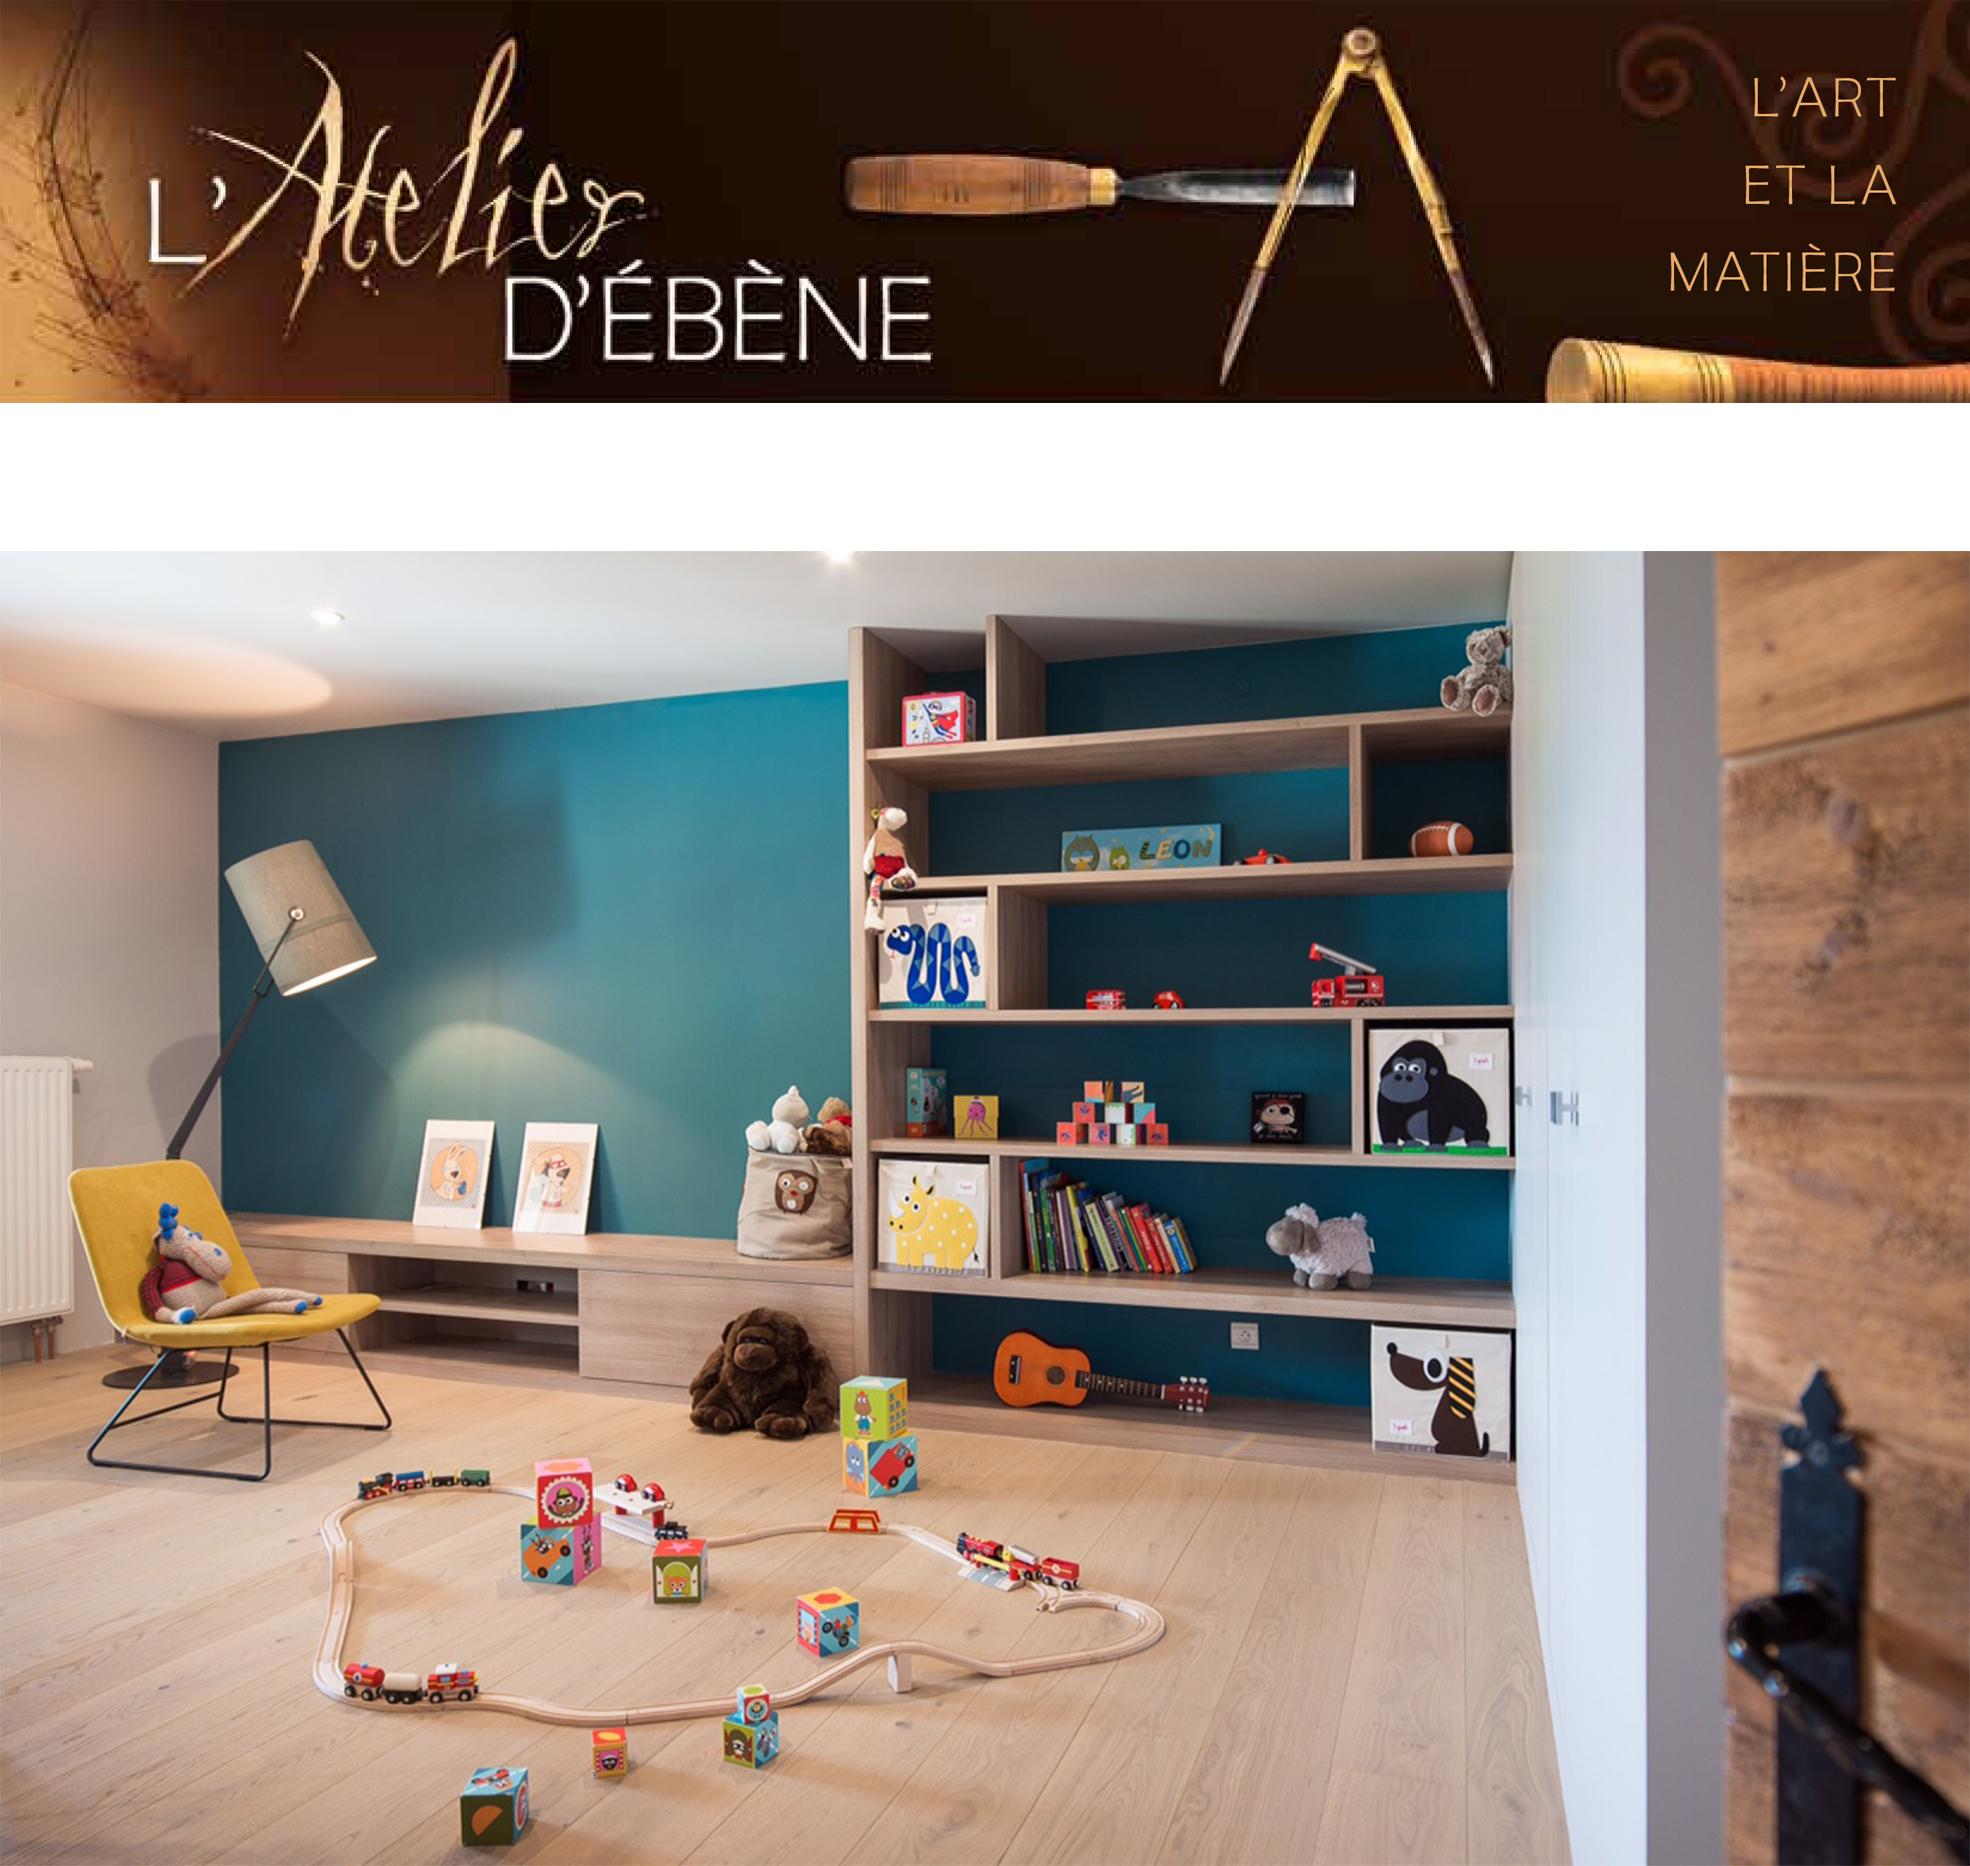 atelier-ebene-web16-2.png